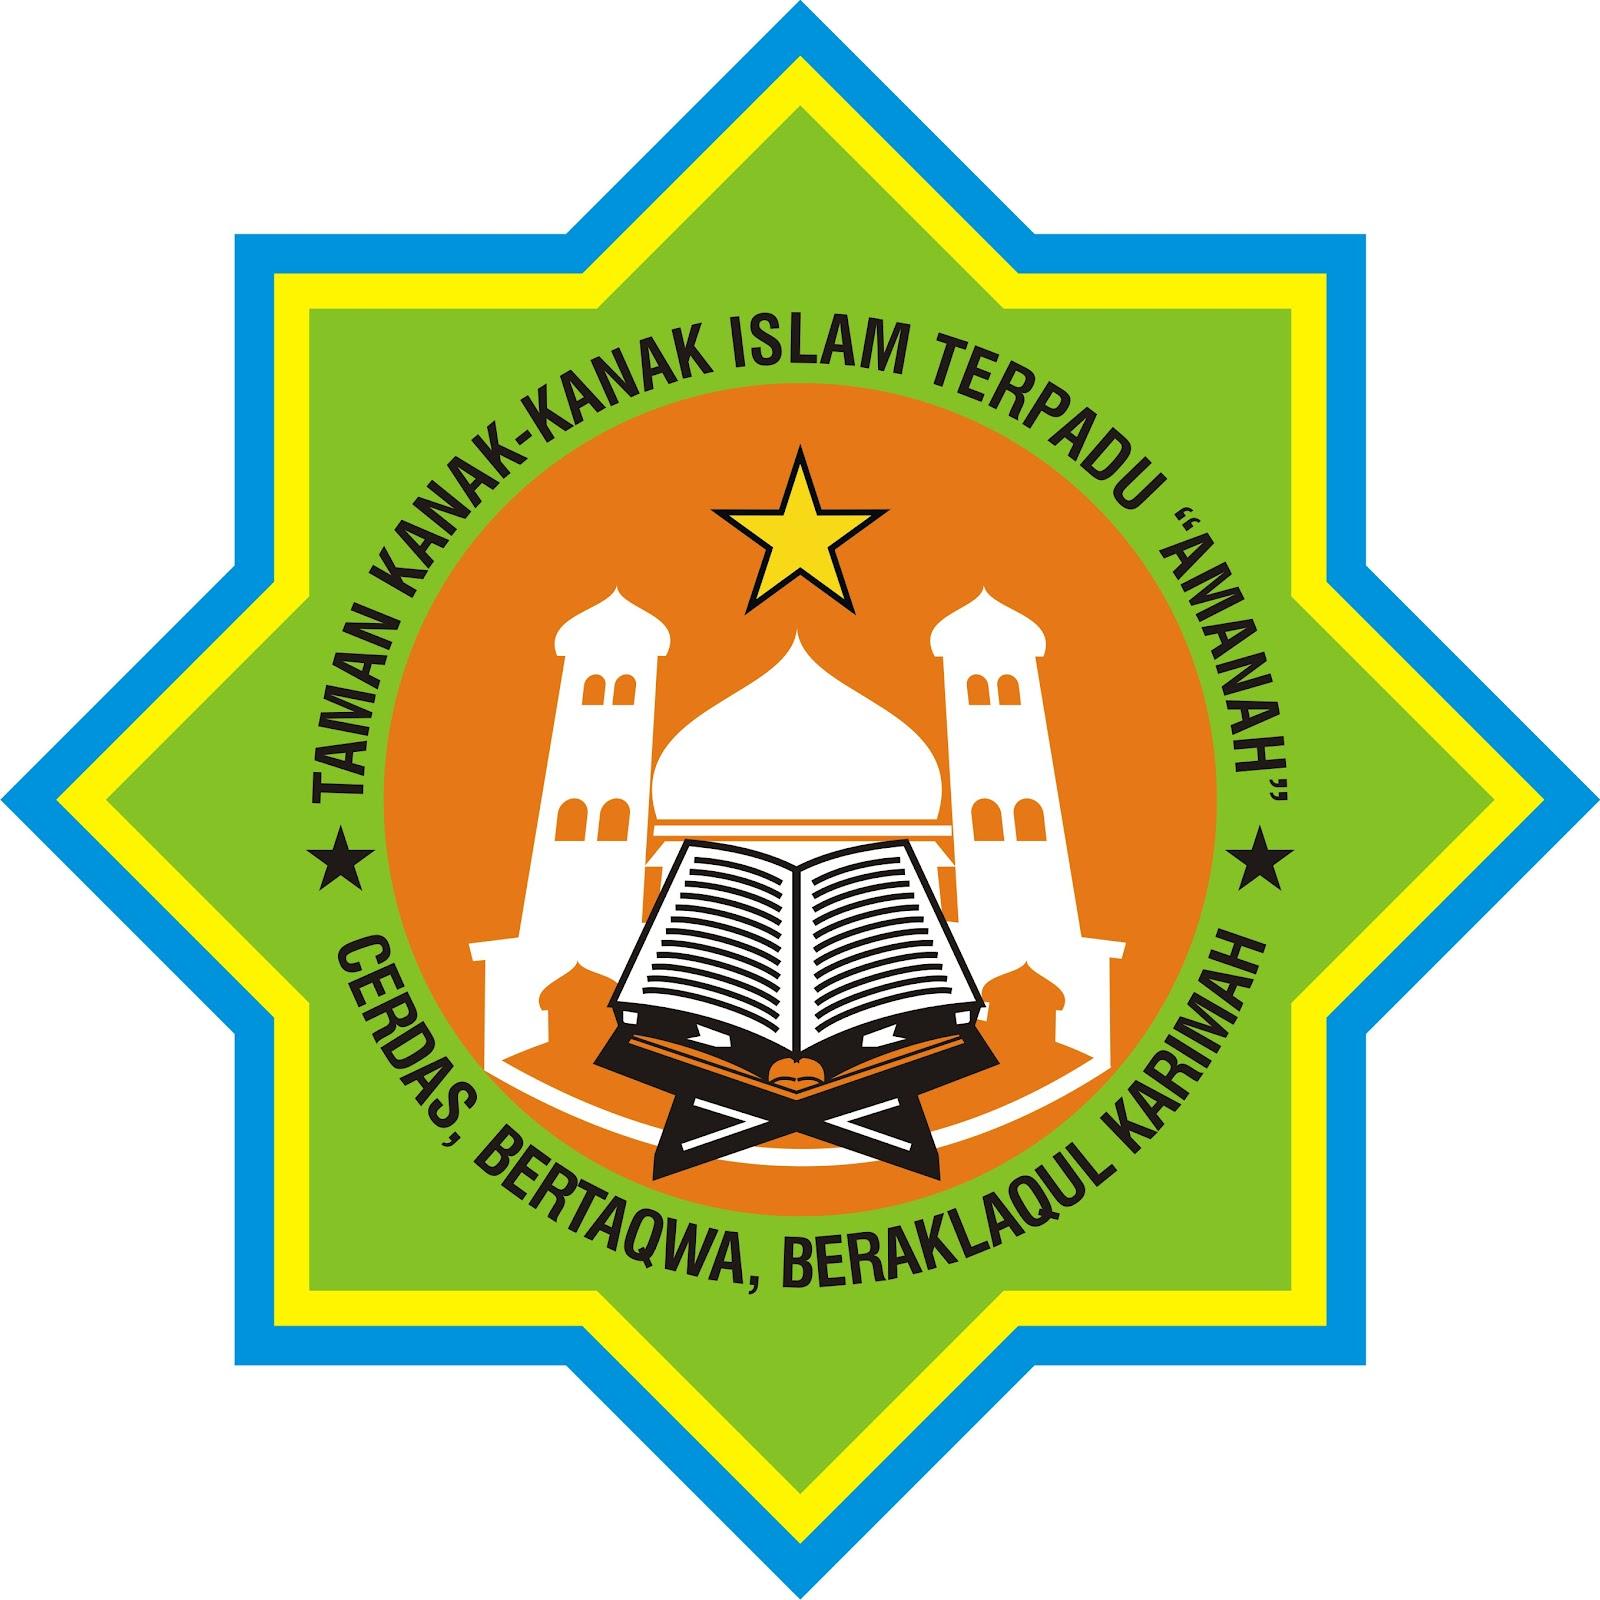 Konveksi Empat Putra Group: Contoh Logo